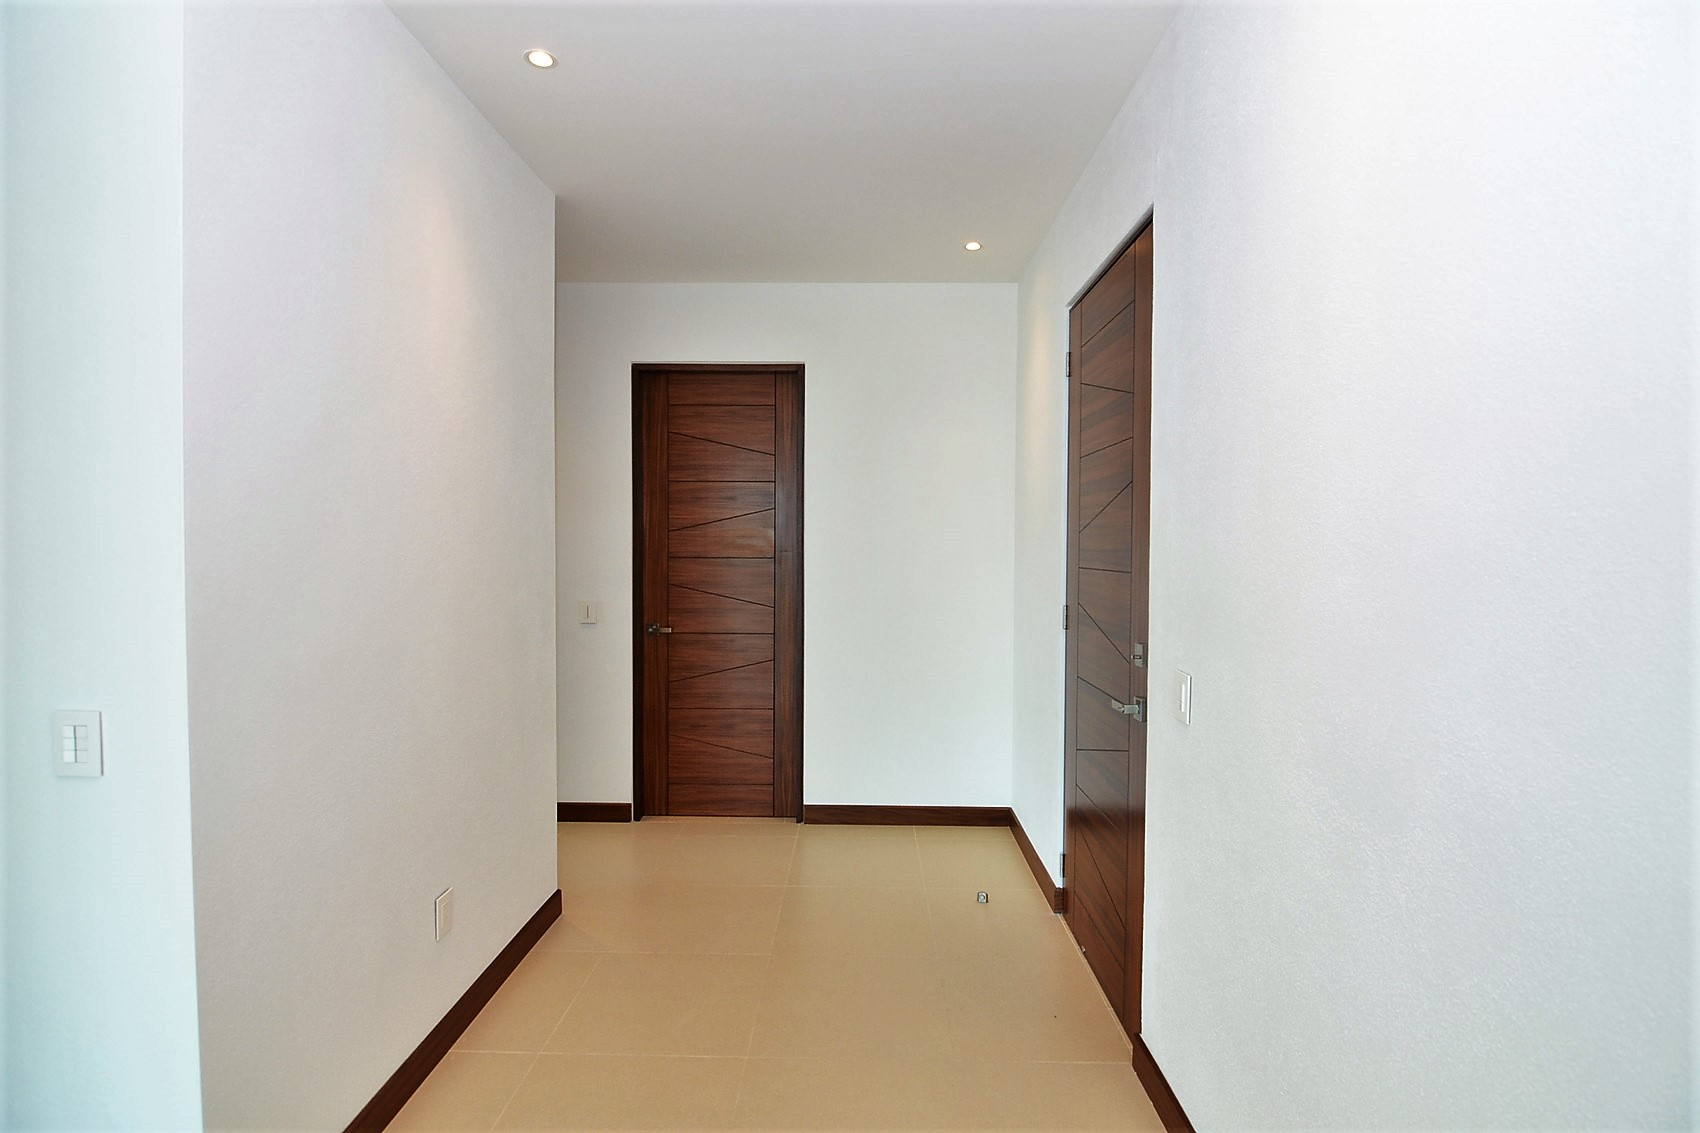 Condo VMarina PH10 - Puerto Vallarta Luxury Condo For Rent (13)